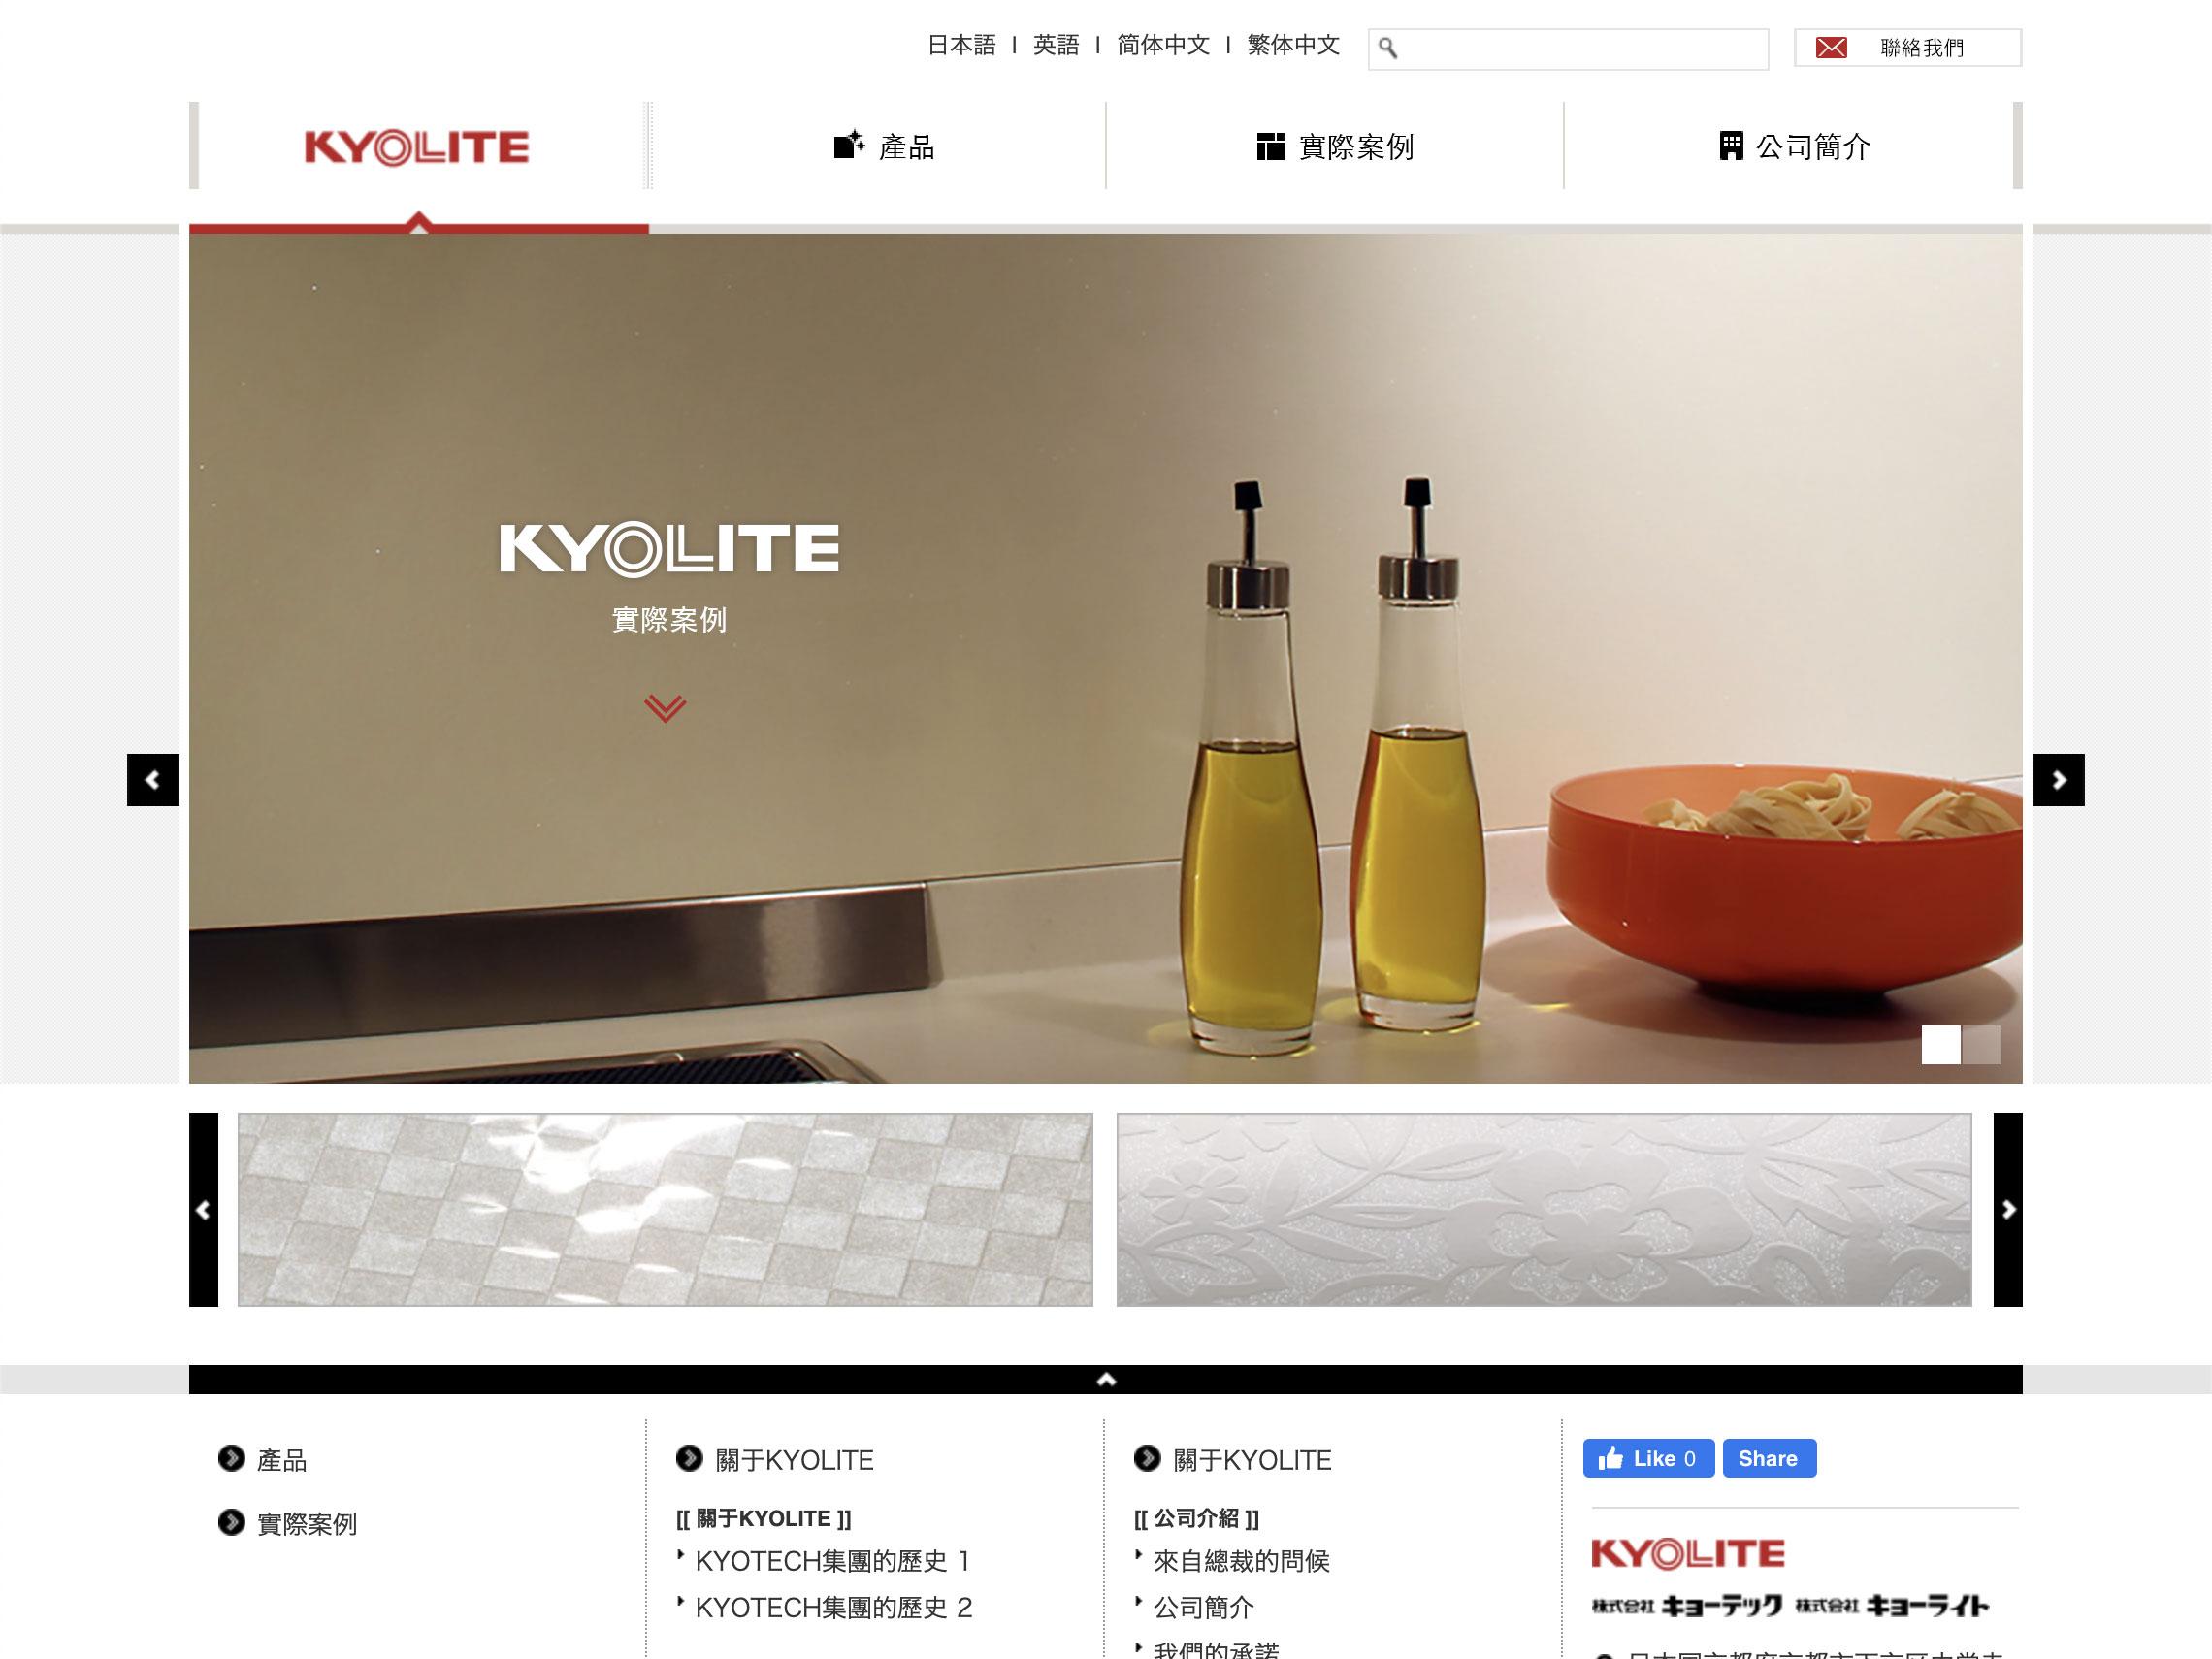 KYOLITE 外国語サイト